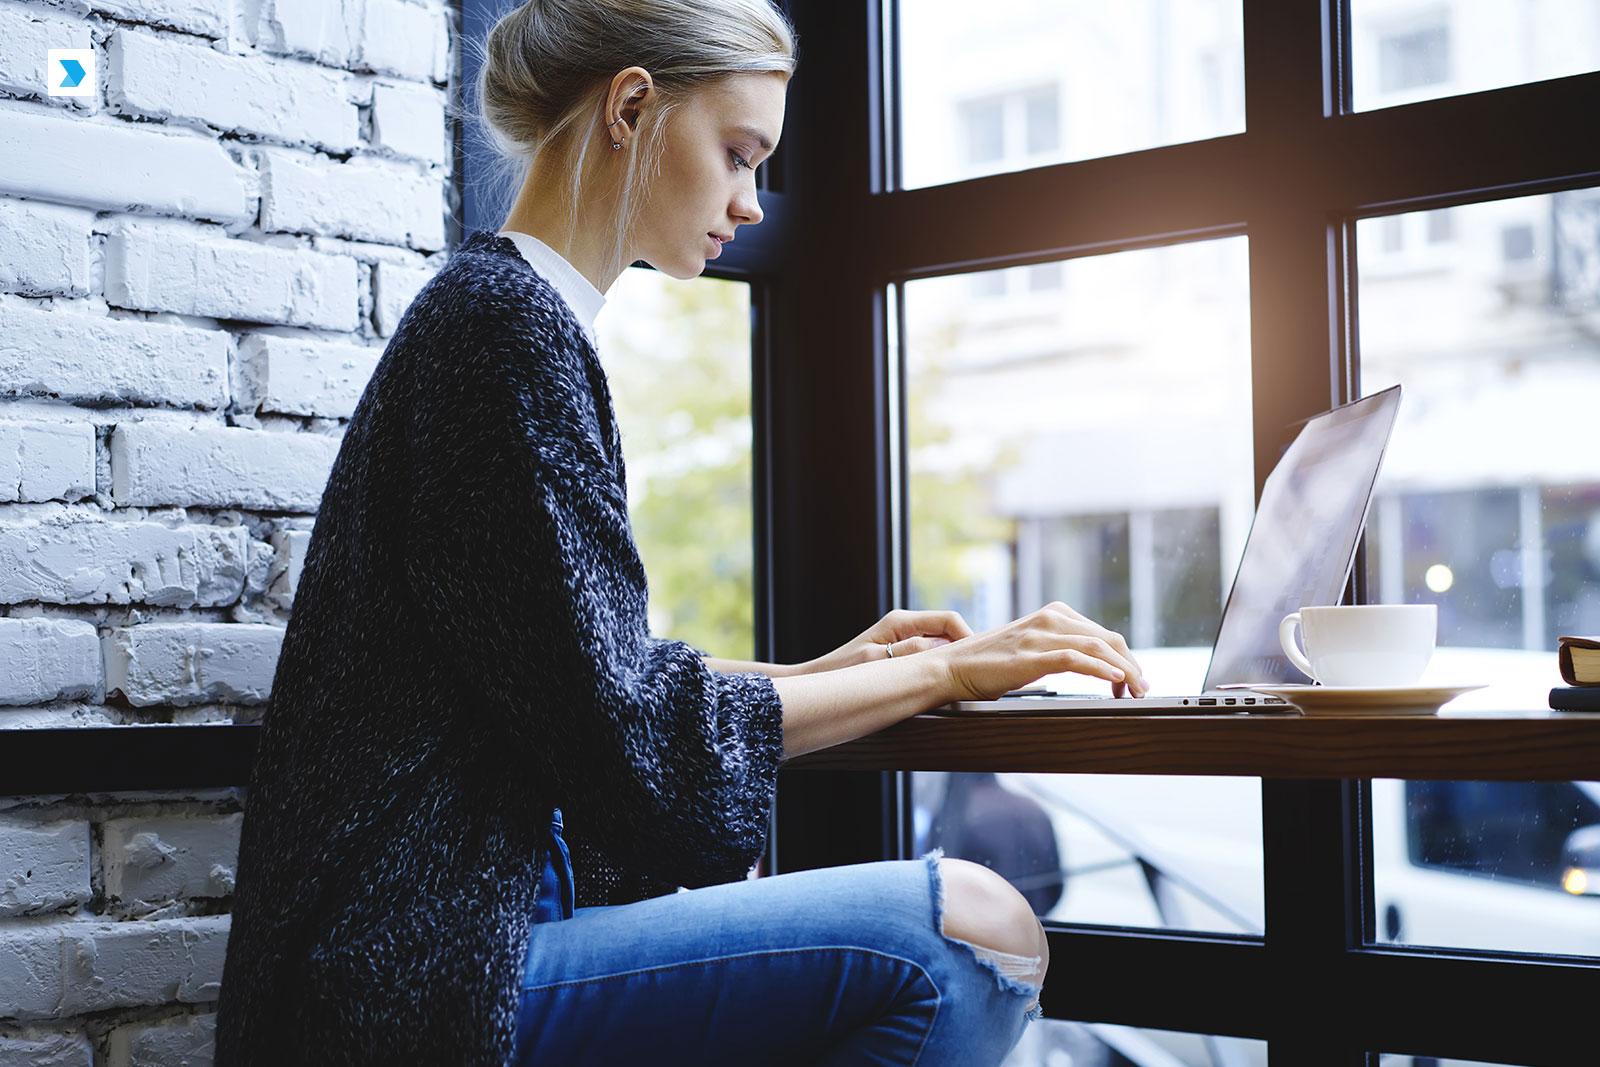 Tips for Writing a Great Digital Marketing CV